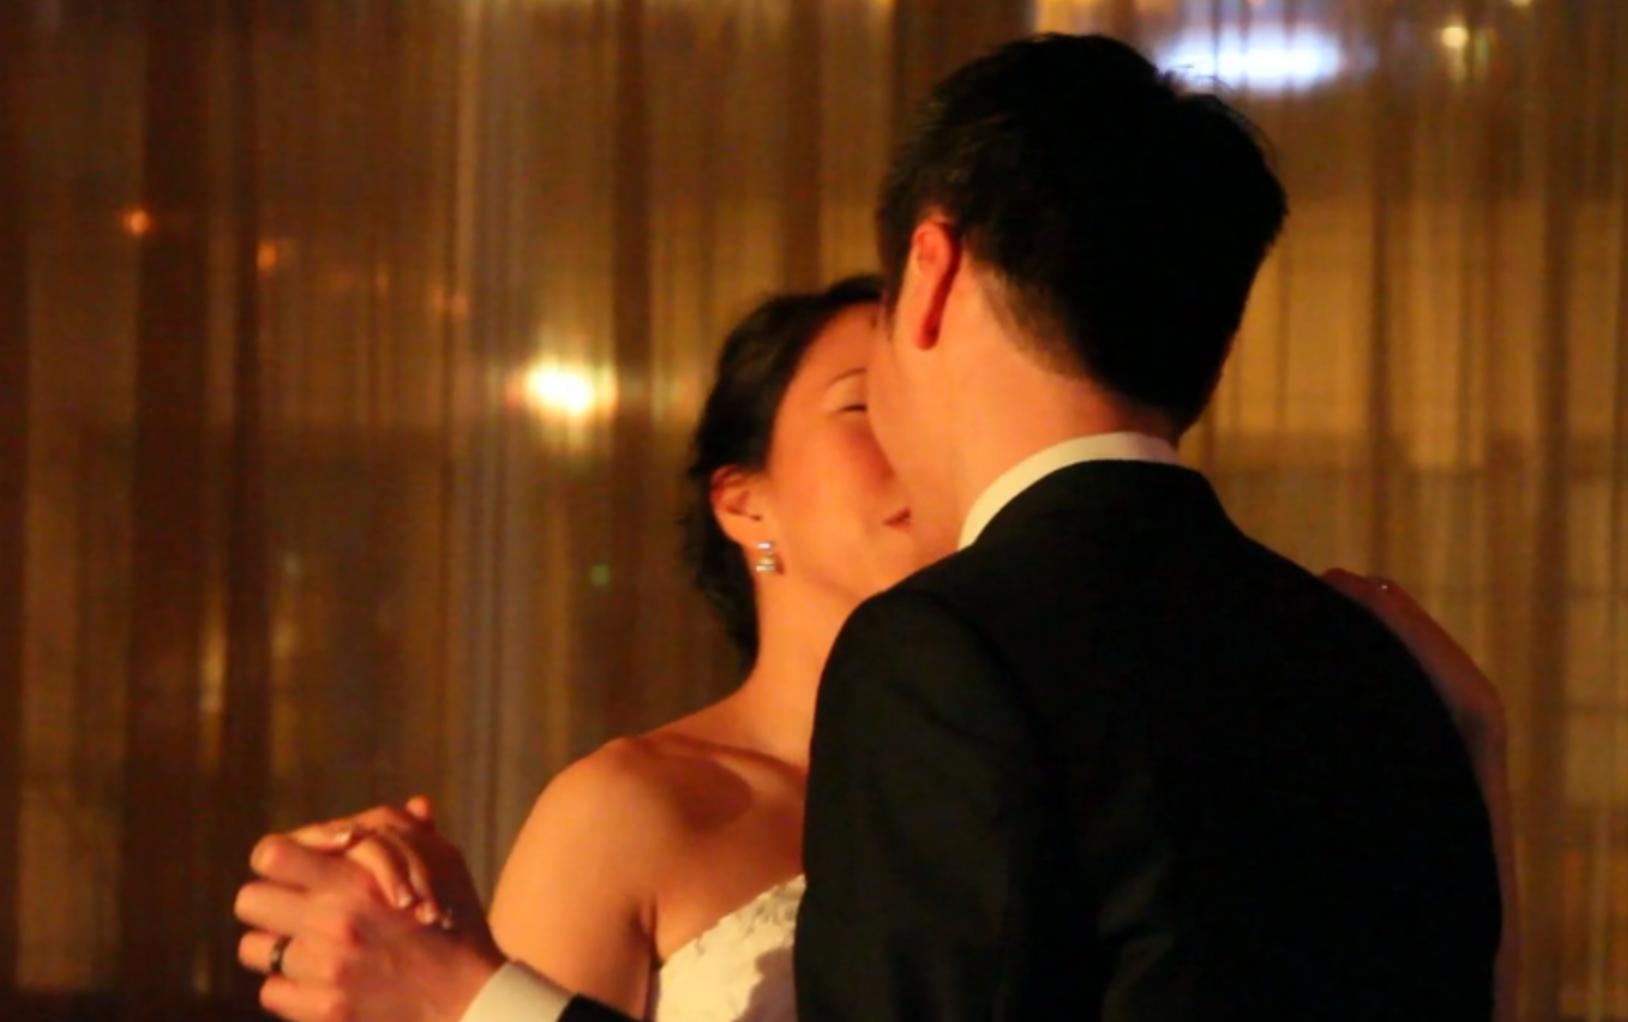 wedding video editing service